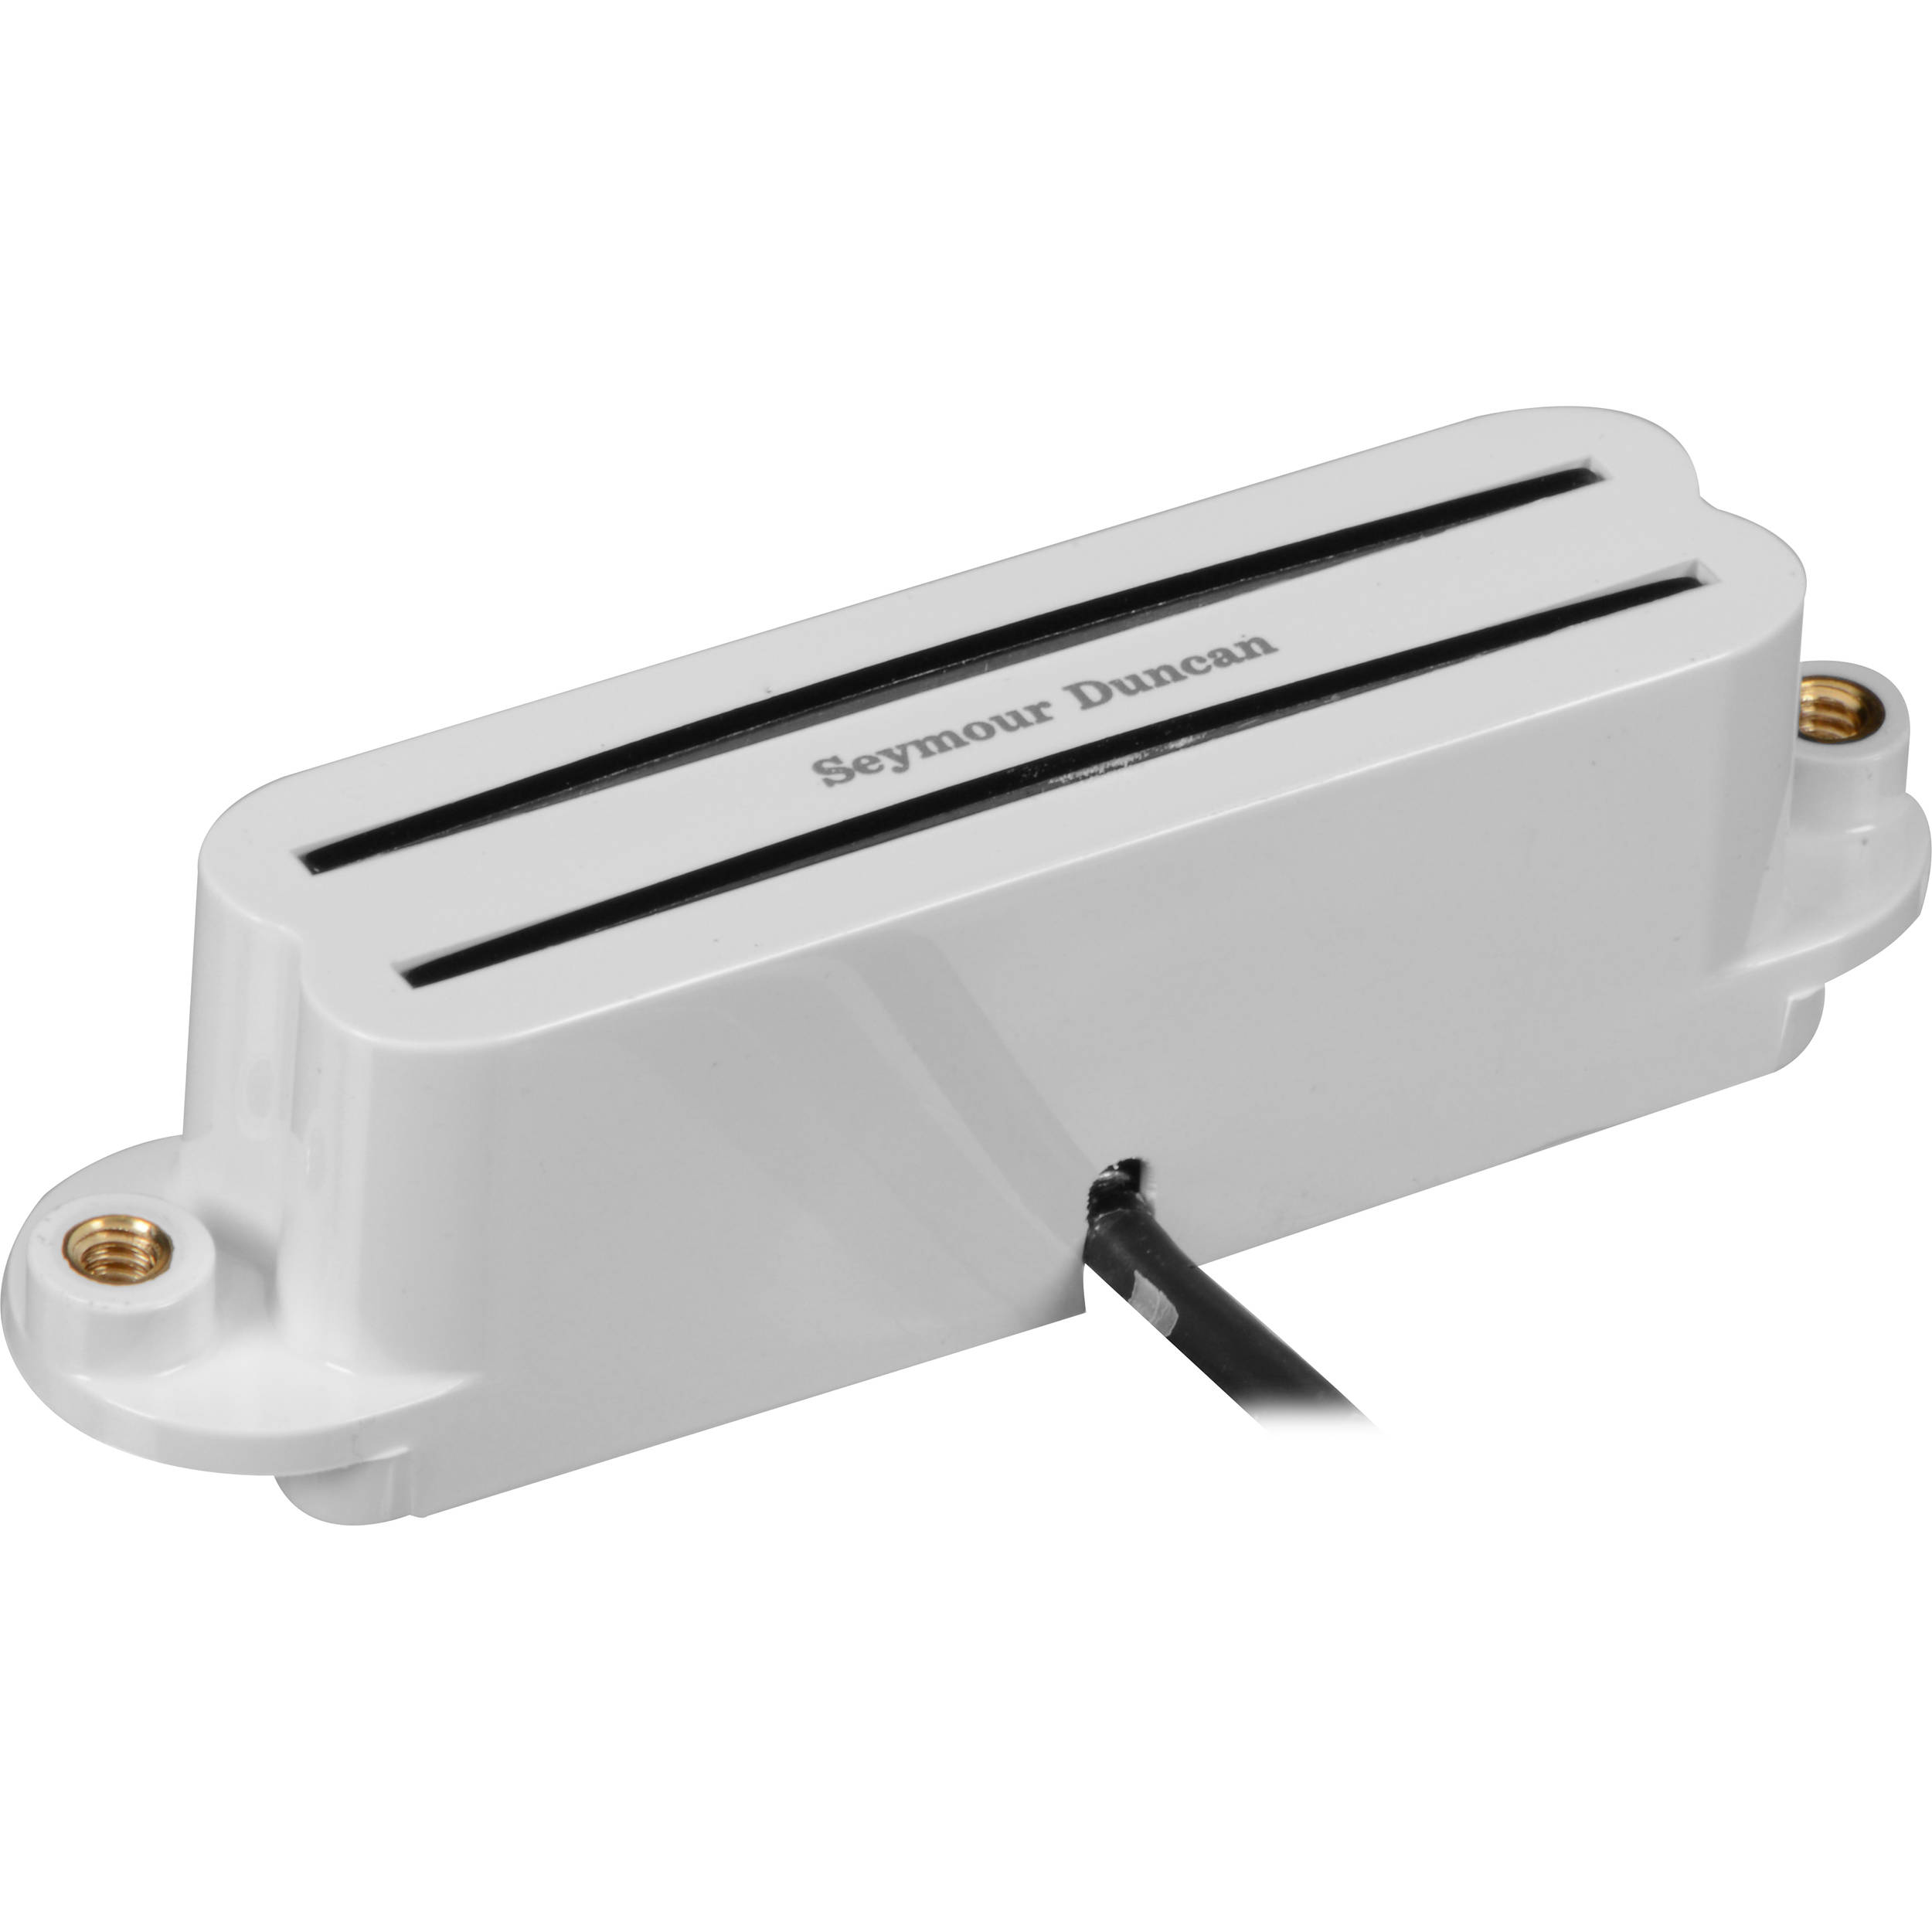 Seymour Duncan SHR-1B Hot Rails Strat Single-Coil 11205-02-W B&H